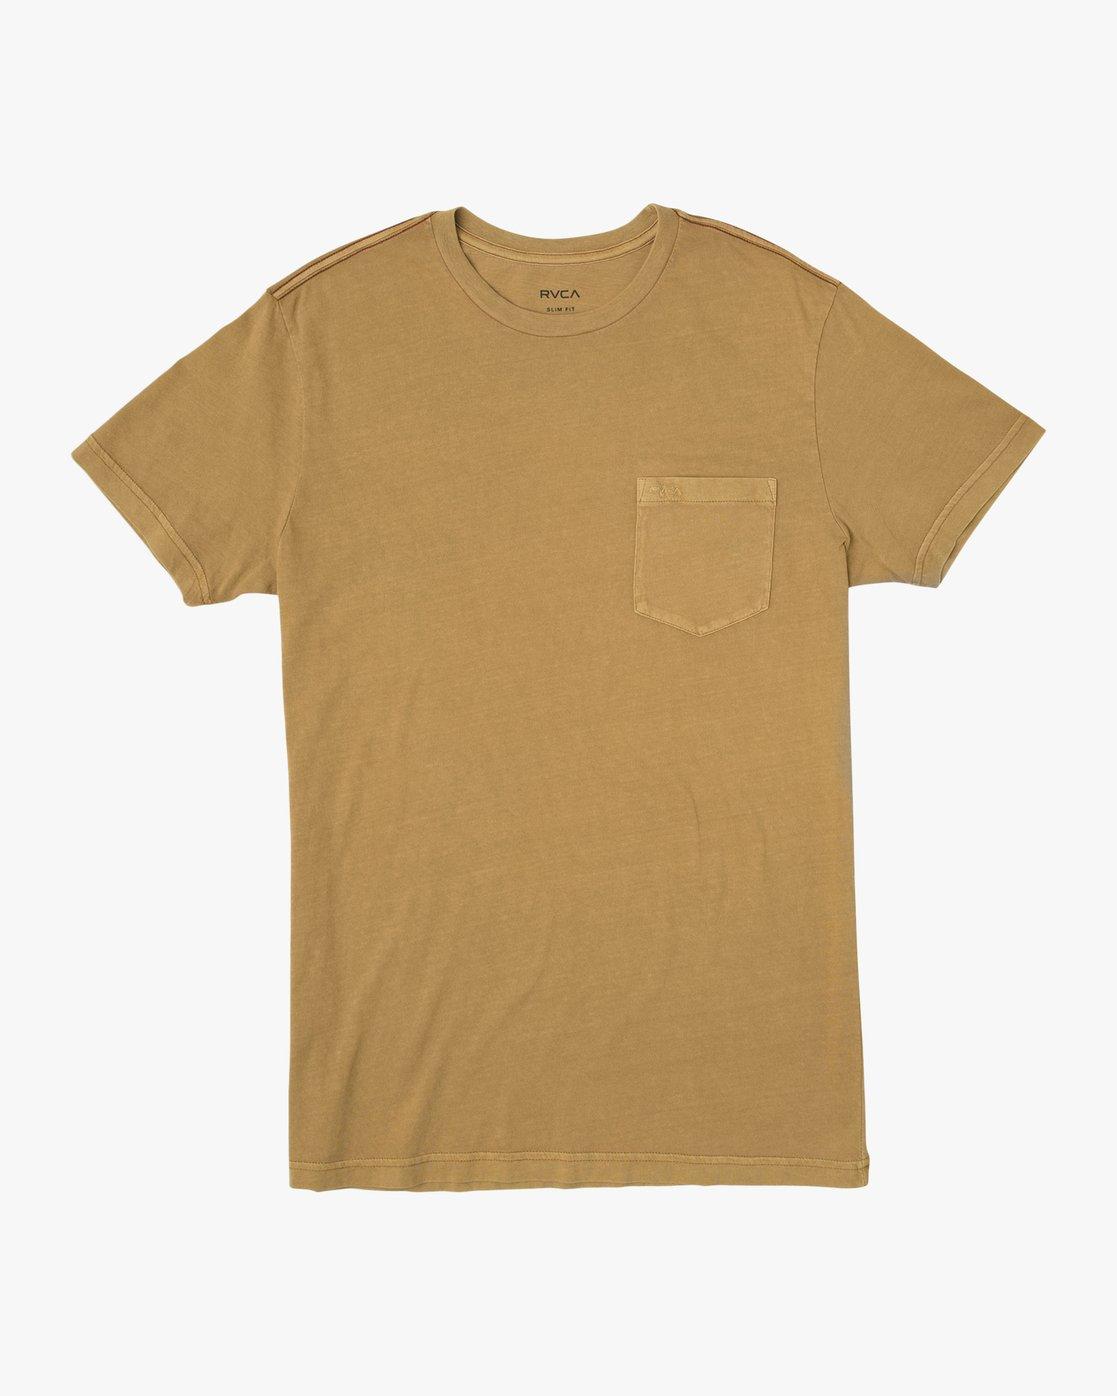 0 PTC 2 Pigment T-Shirt Brown M437TRPT RVCA